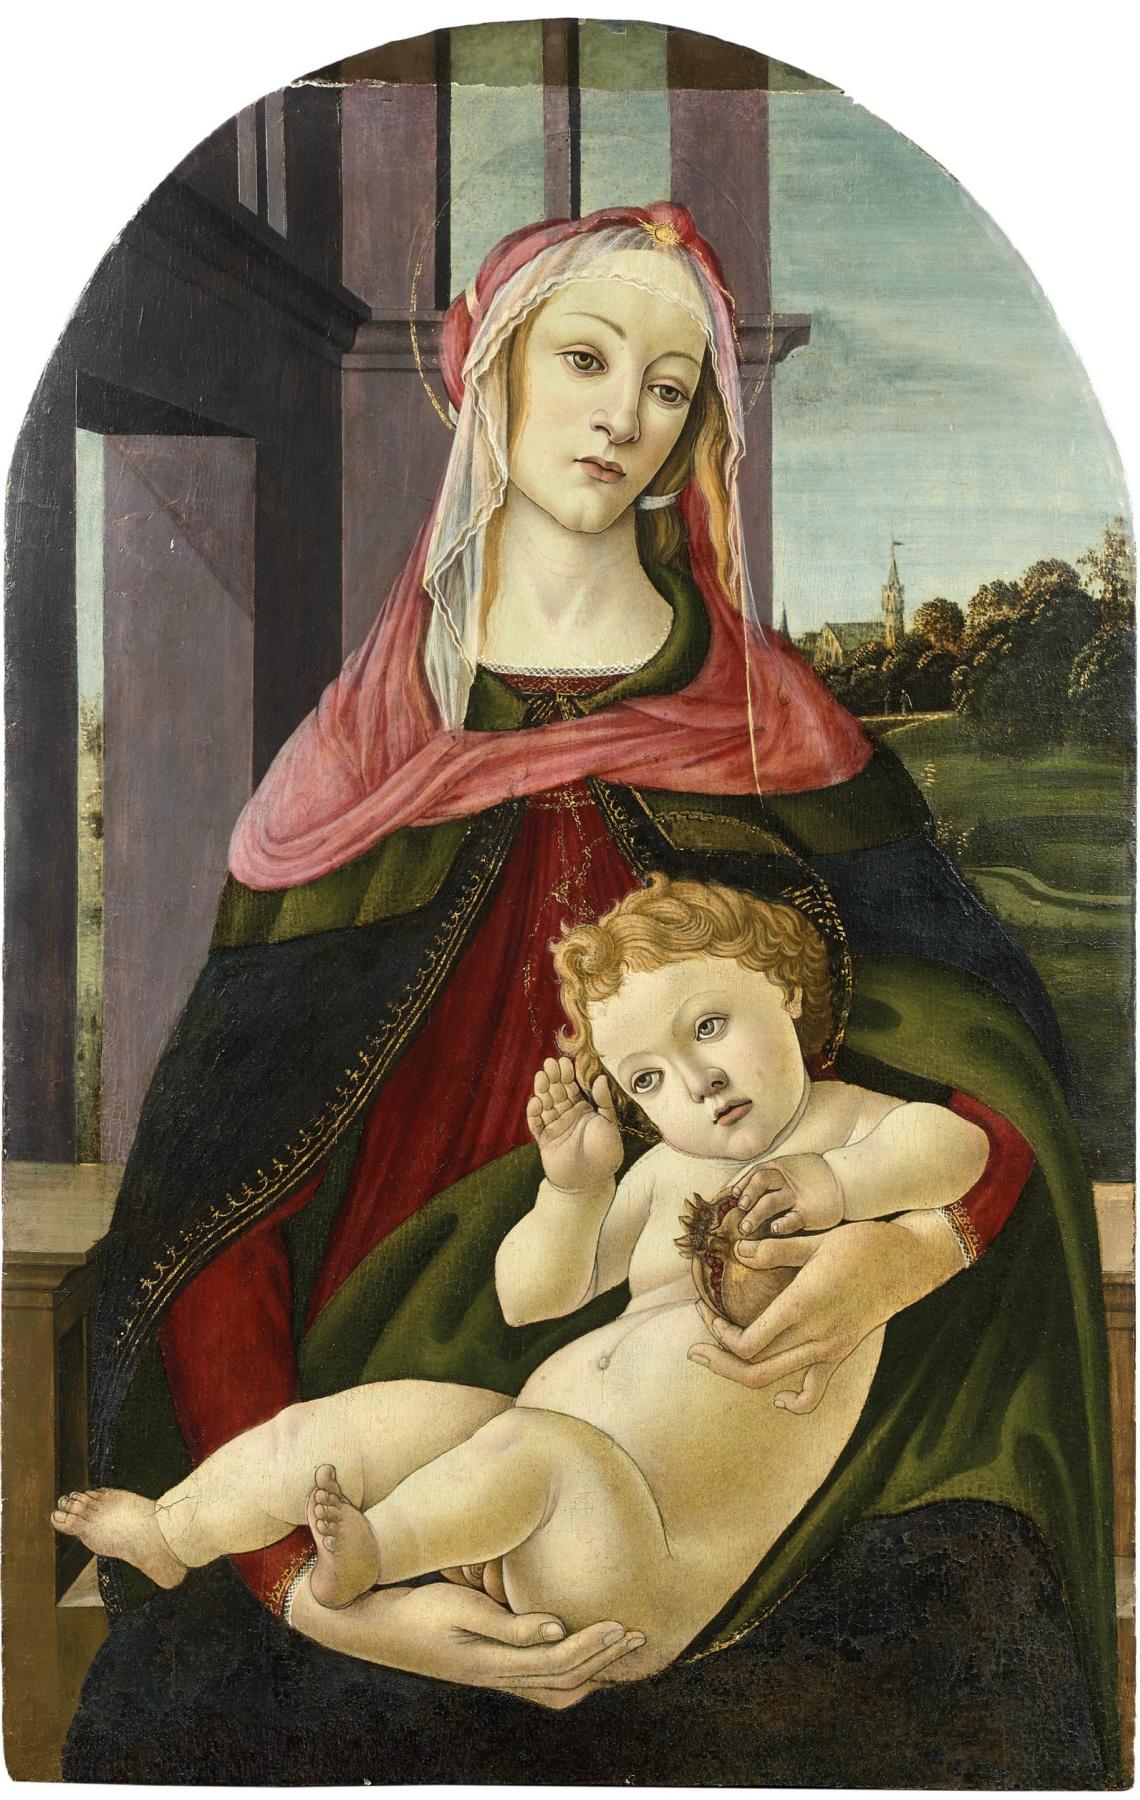 Sandro Botticelli. Madonna of the Pomegranate